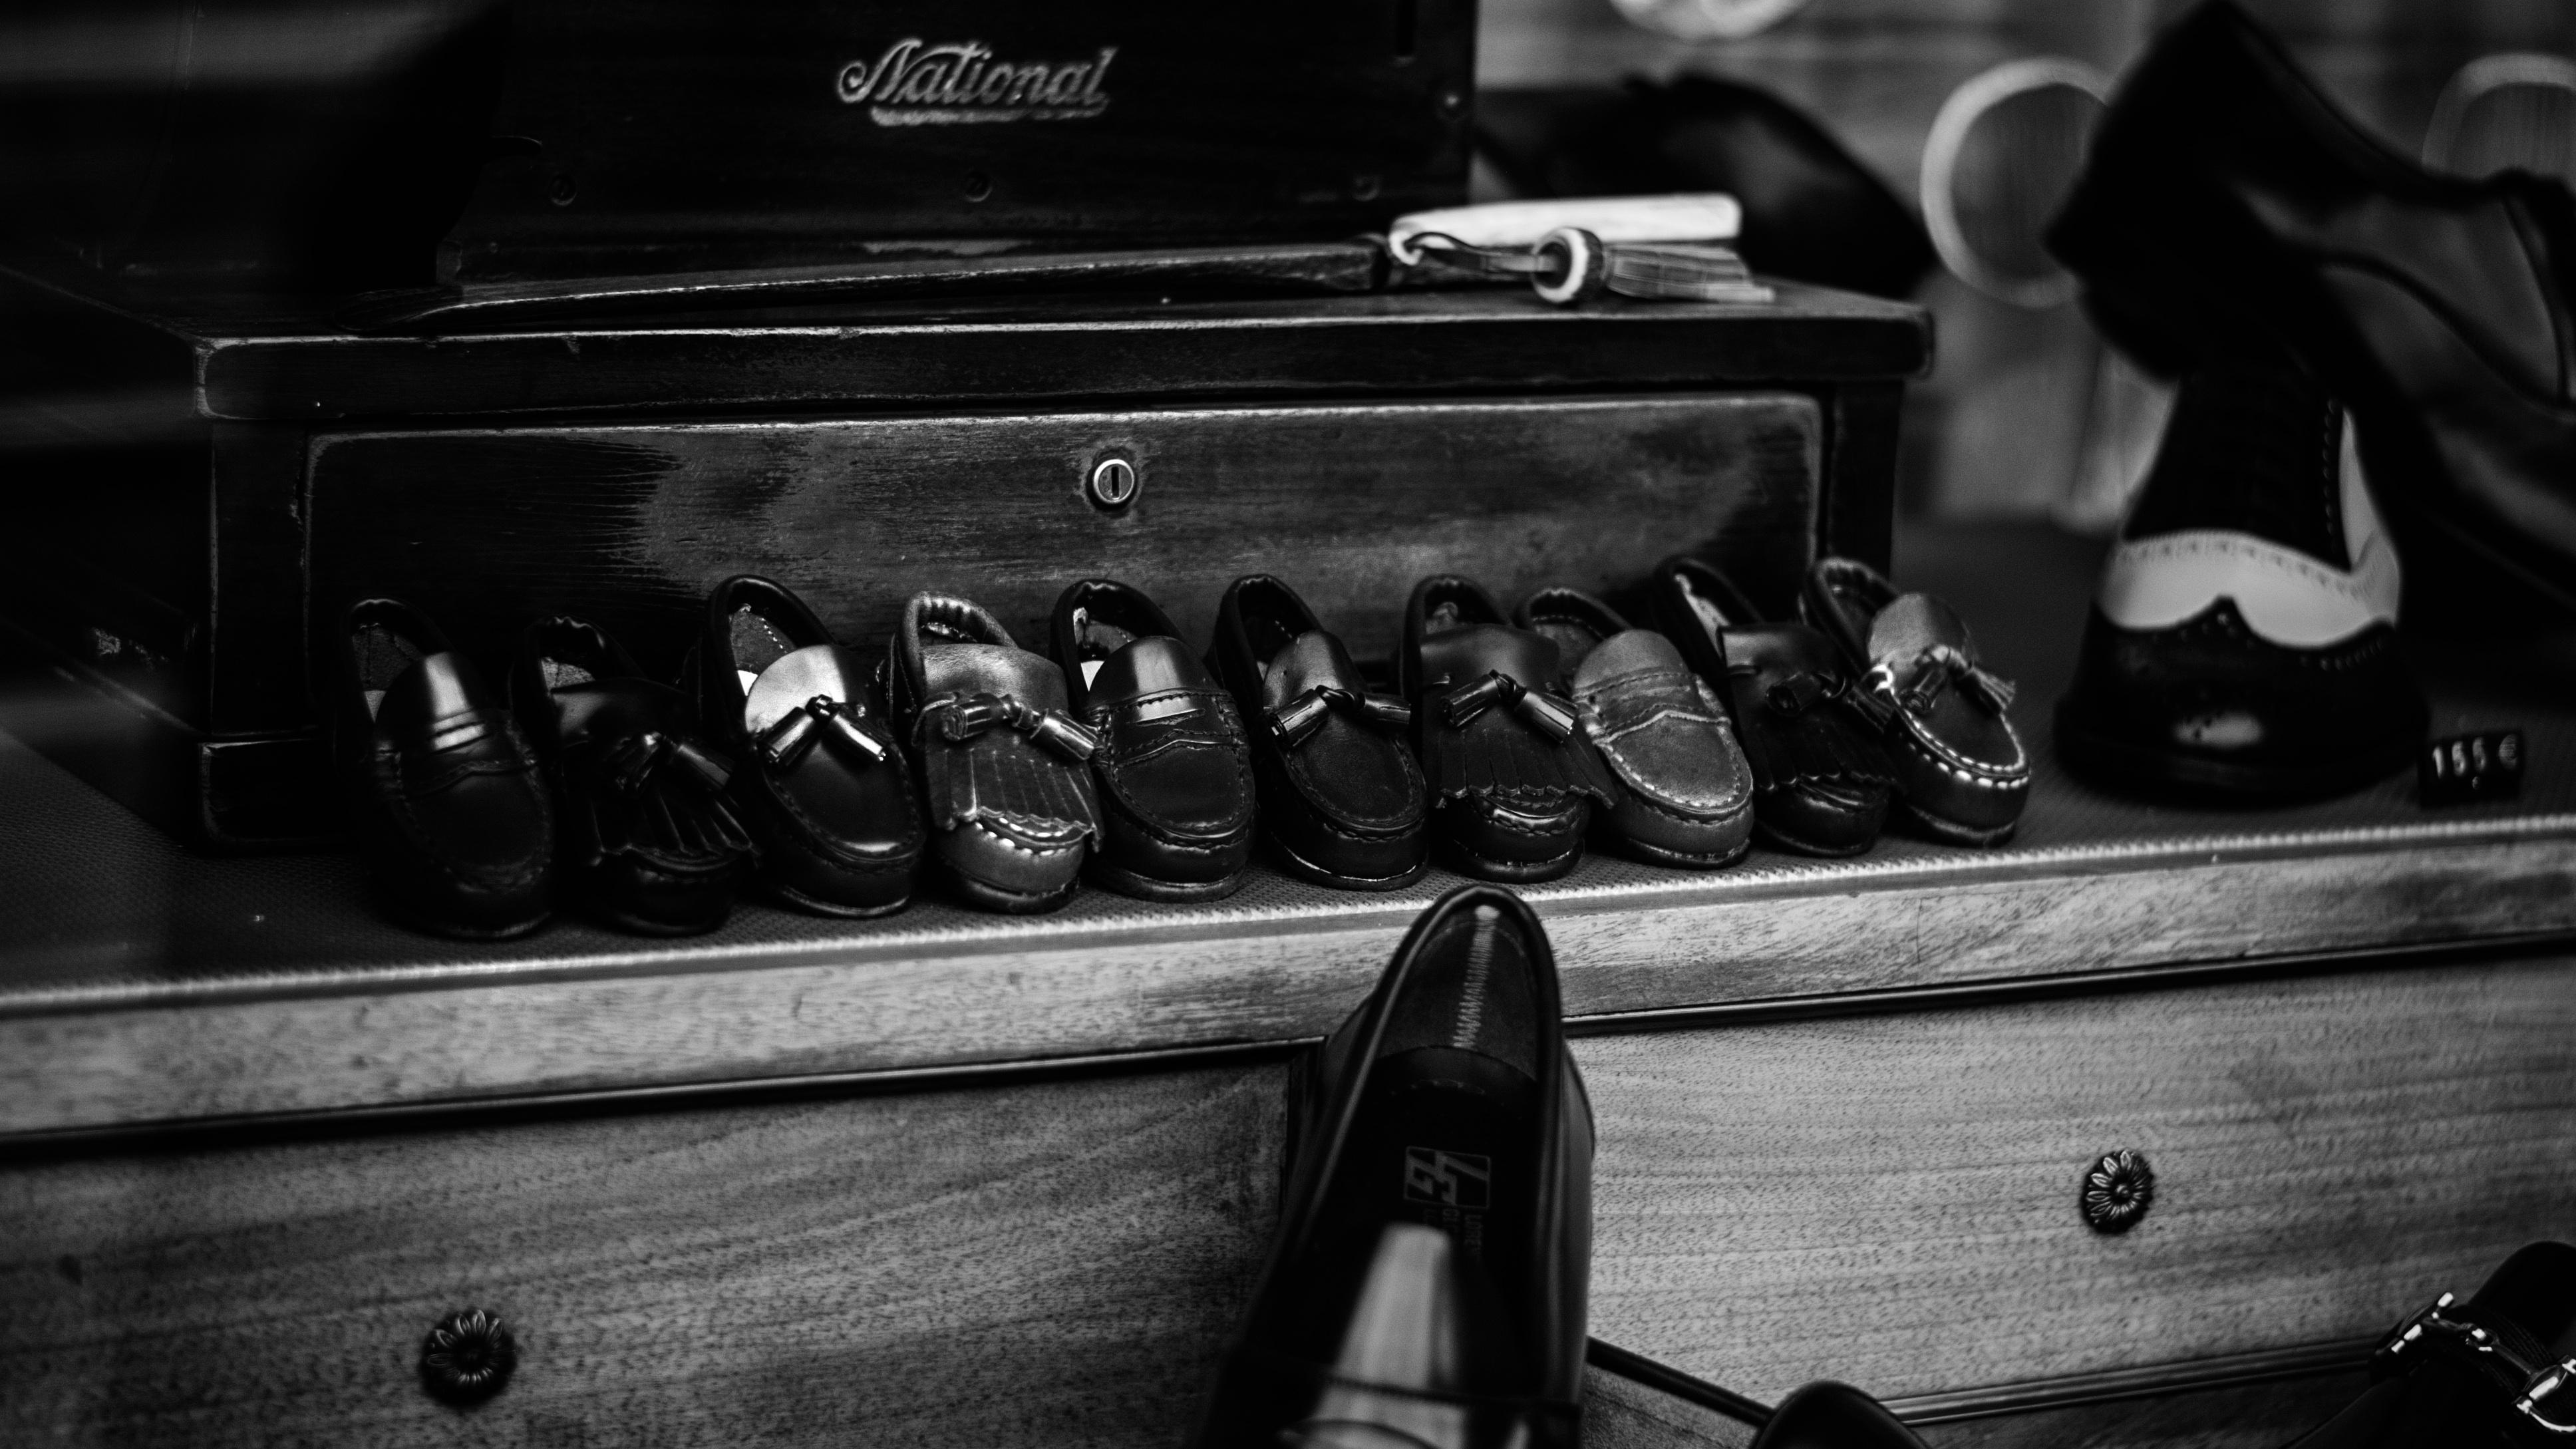 Free images : black and white typewriter darkness monochrome